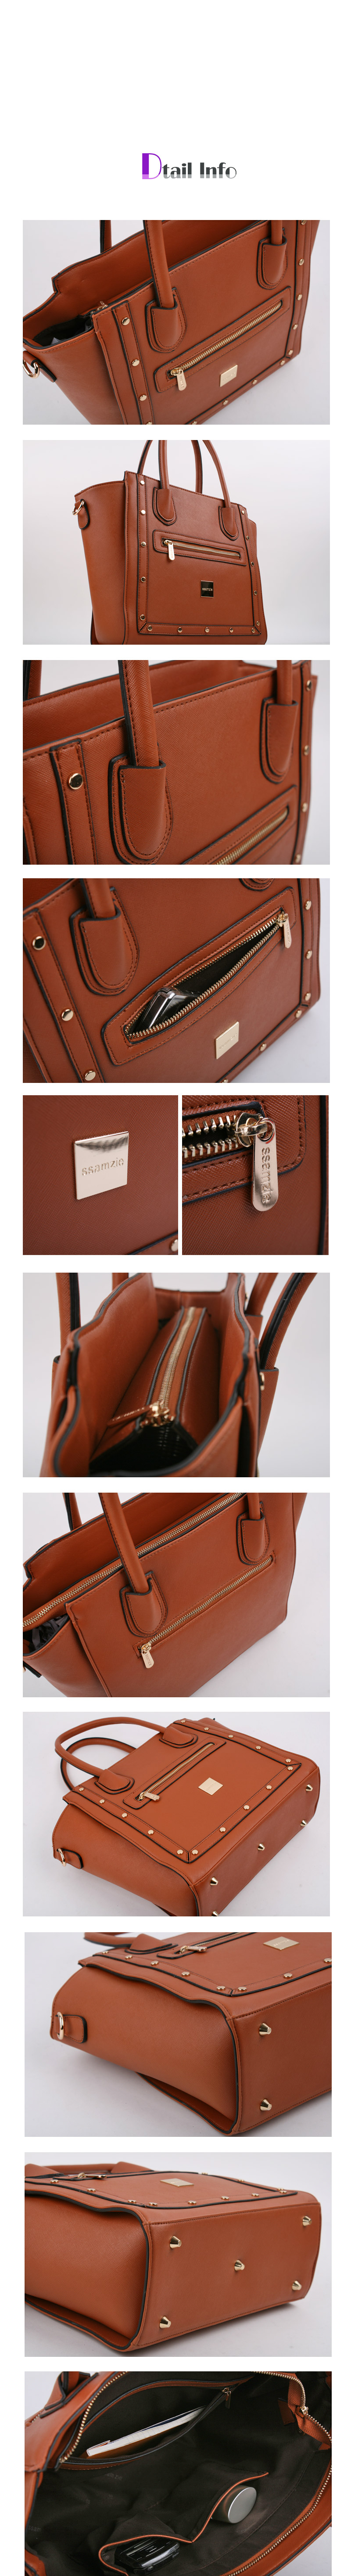 ssamzie handbag no.SSAMZIE-603view-1